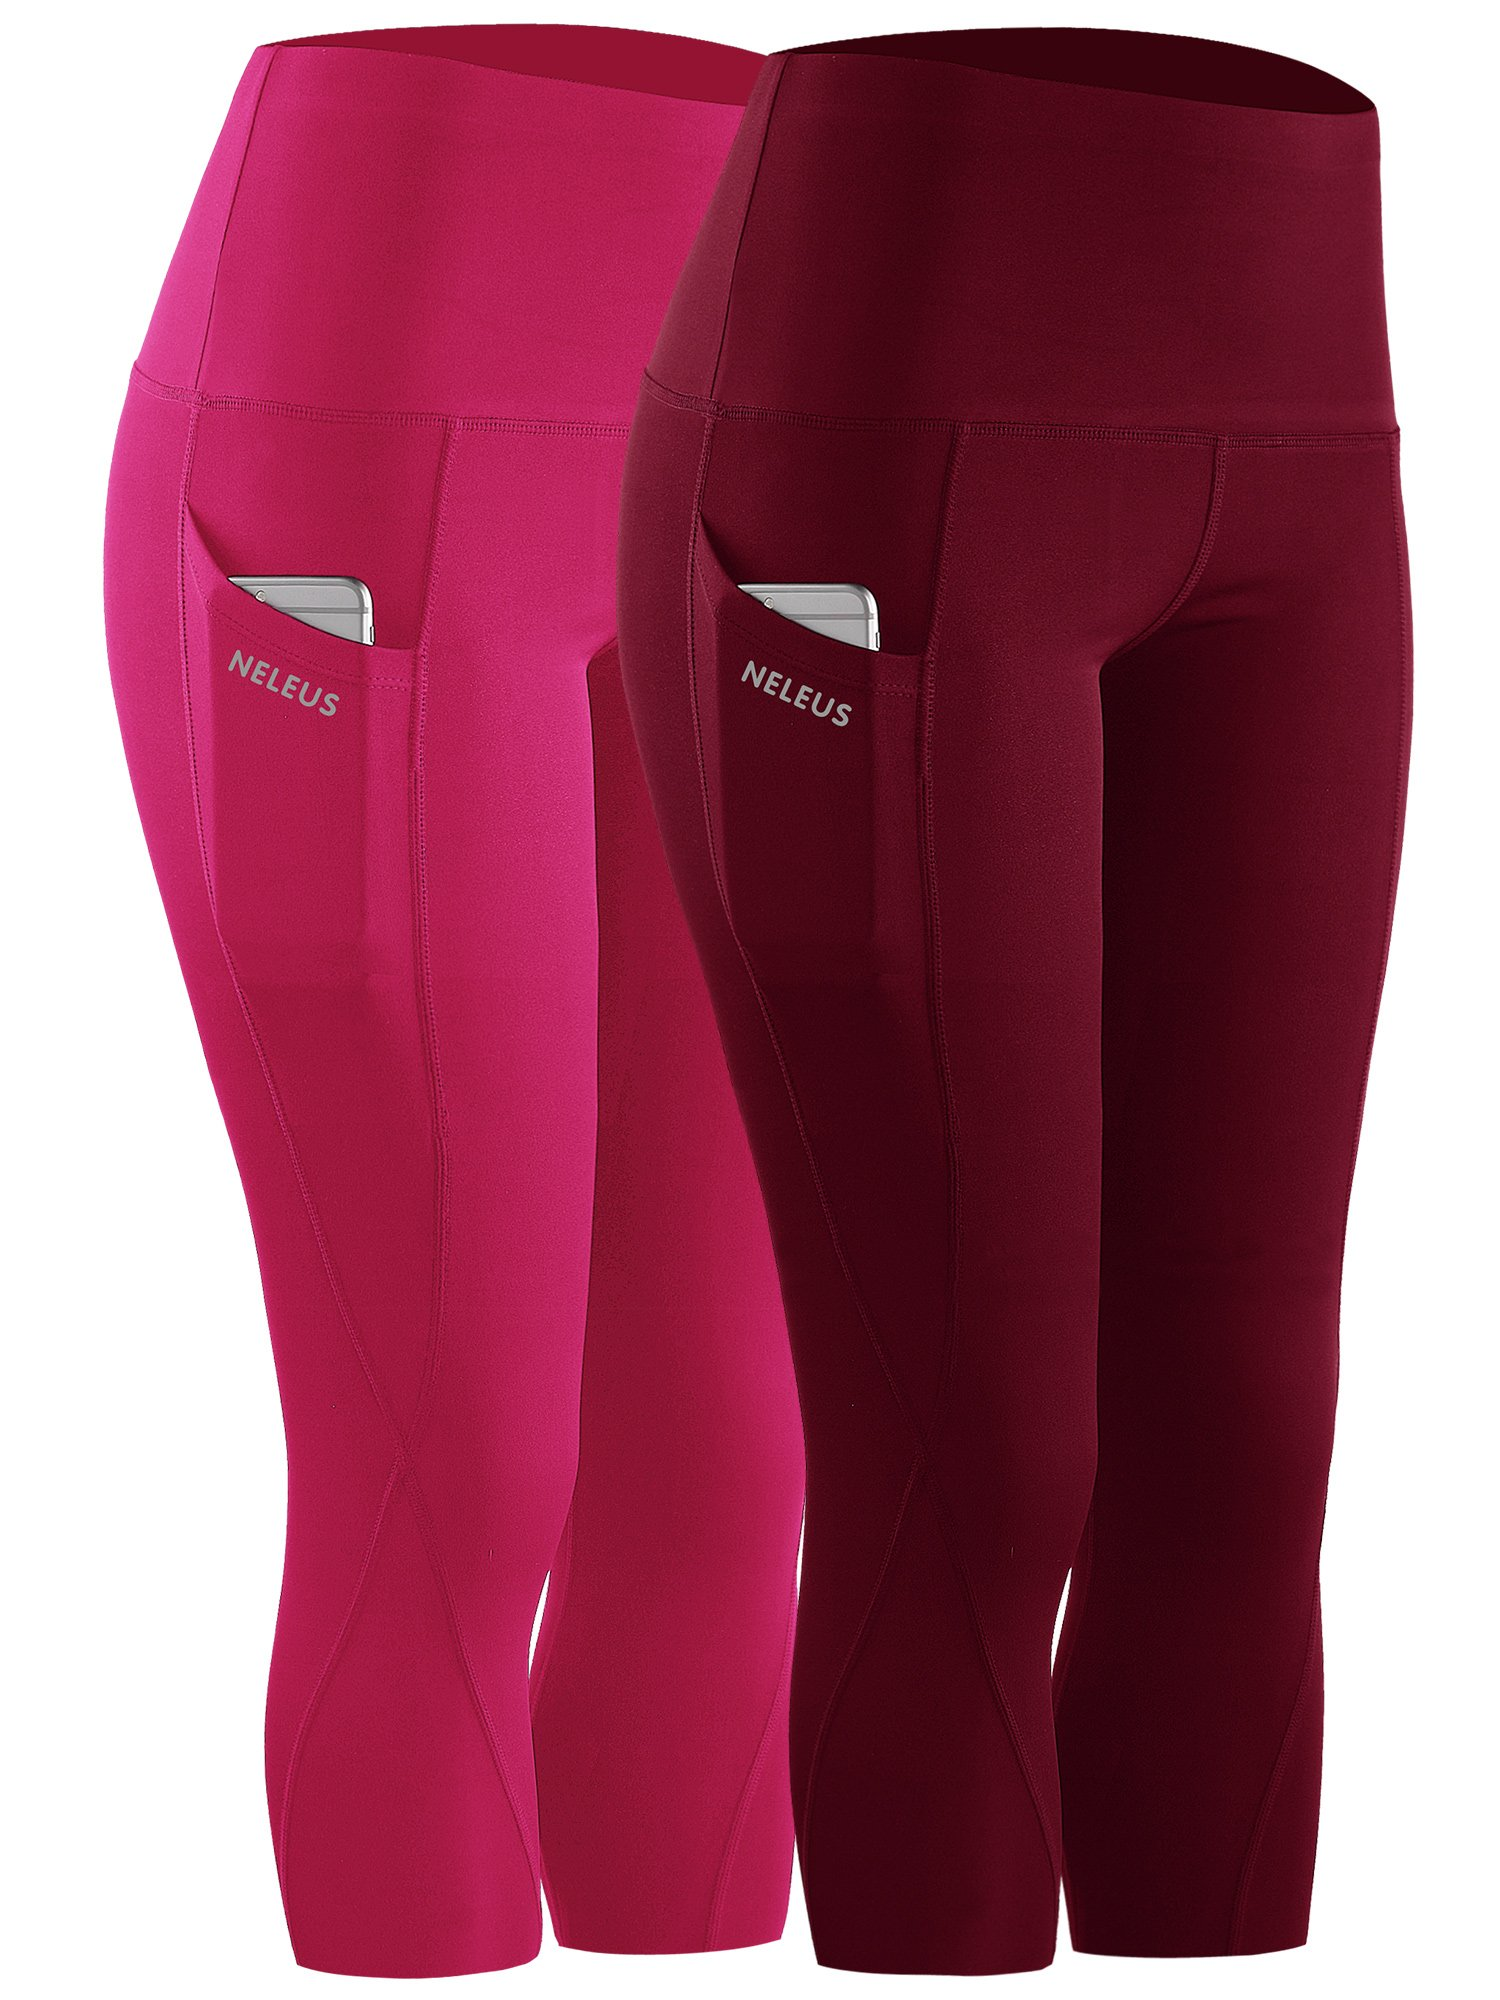 Neleus 2 Pack Tummy Control High Waist Workout Yoga Capri Leggings,9027,Dark red,Rose red,S,EU M